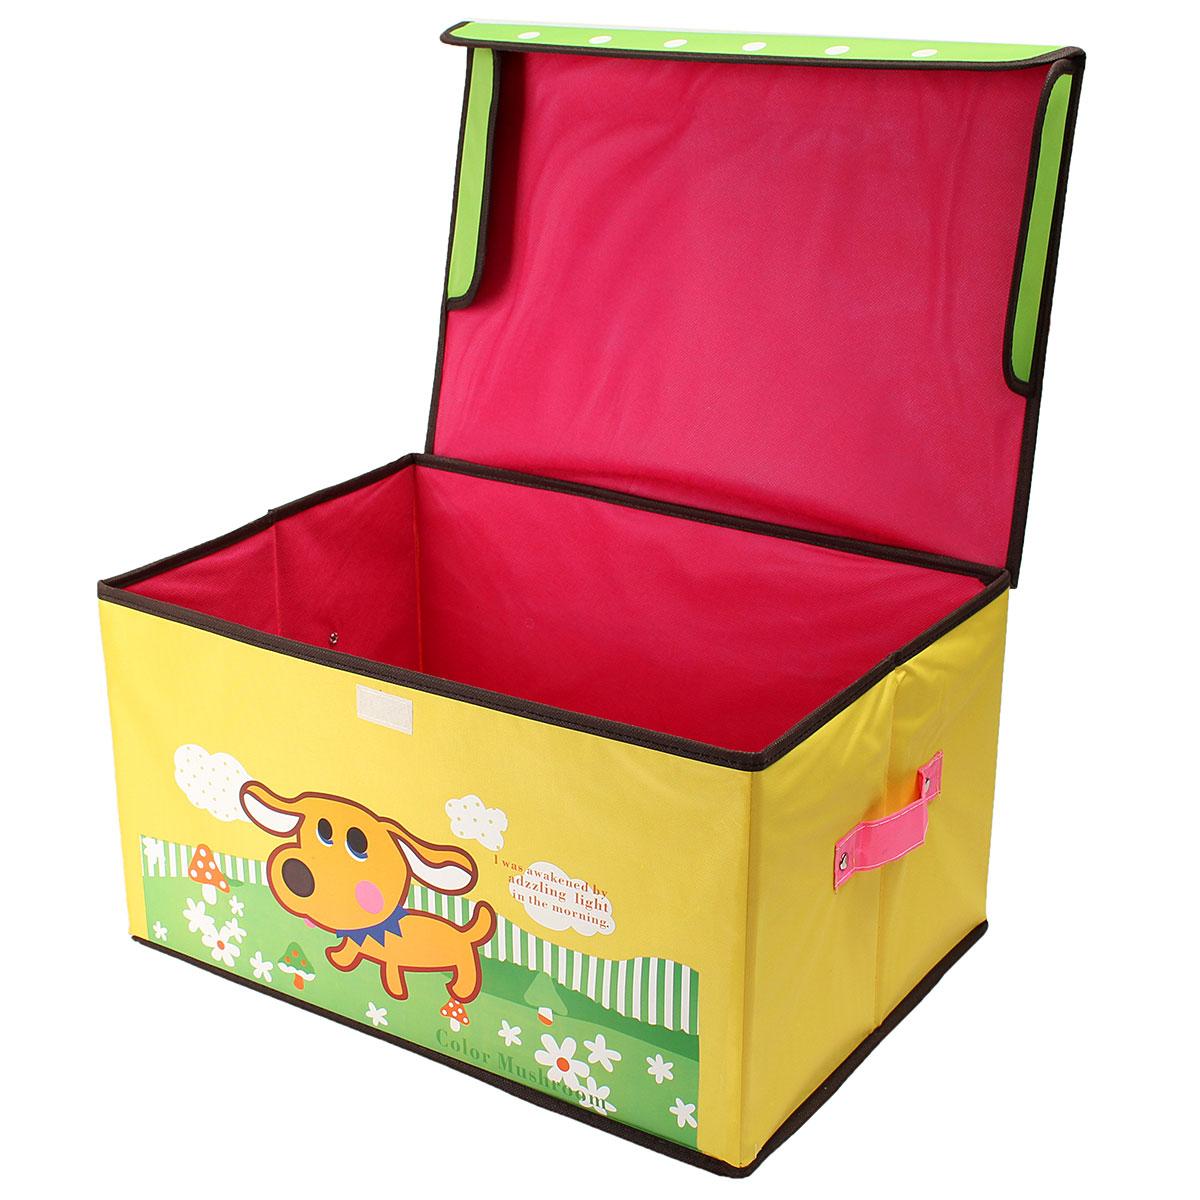 Фотография Storage Toy Box Kids Childrens Large Case Girls Boys Books Chest Clothes Cardboard Framework Gift Housekeeping Organizer